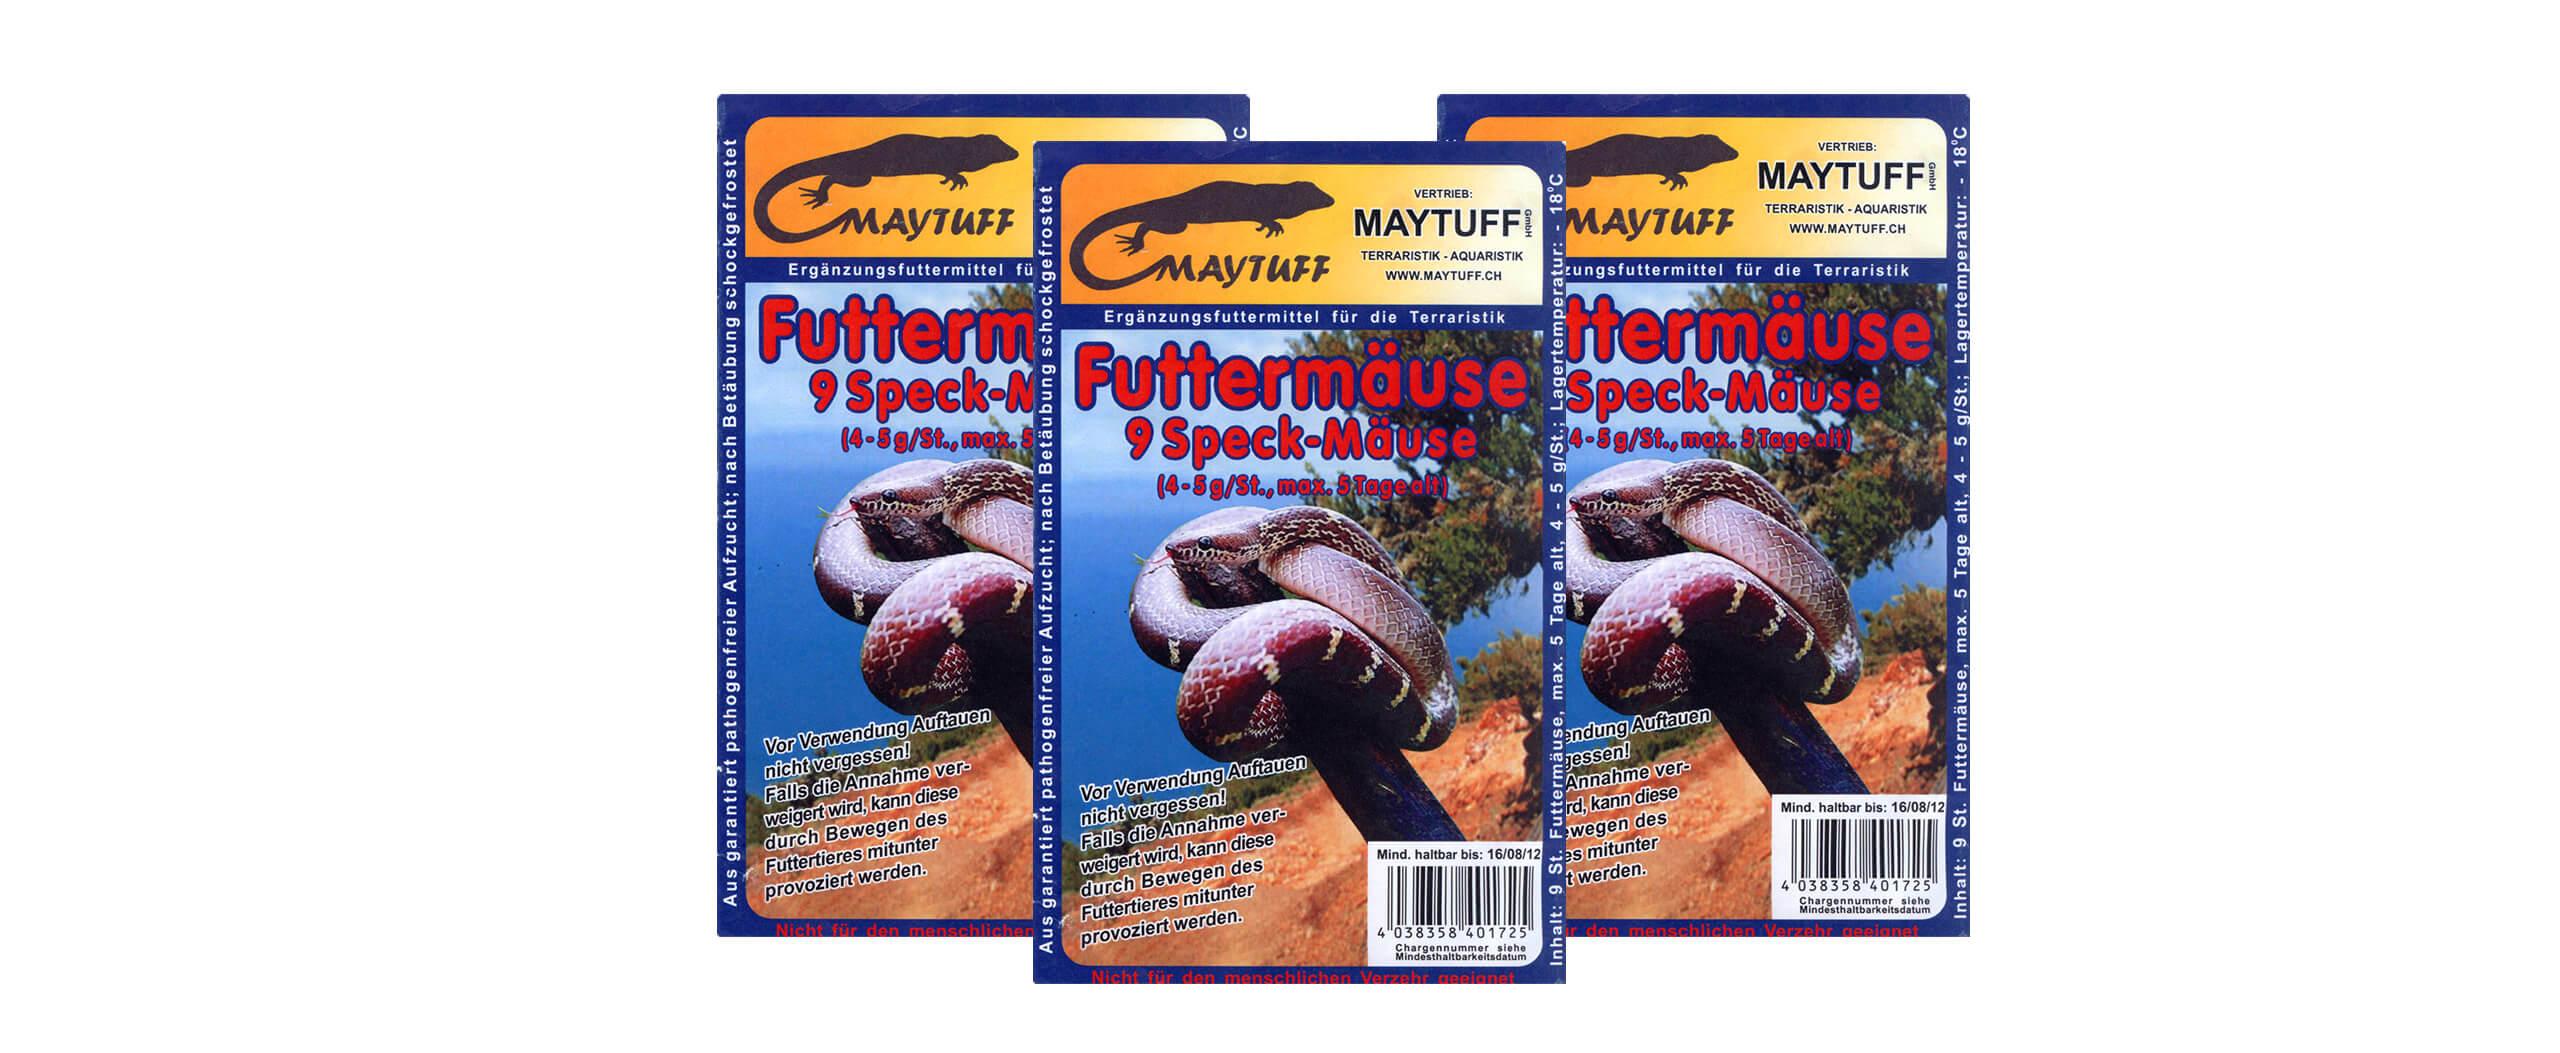 Reptilienfutter im Blister